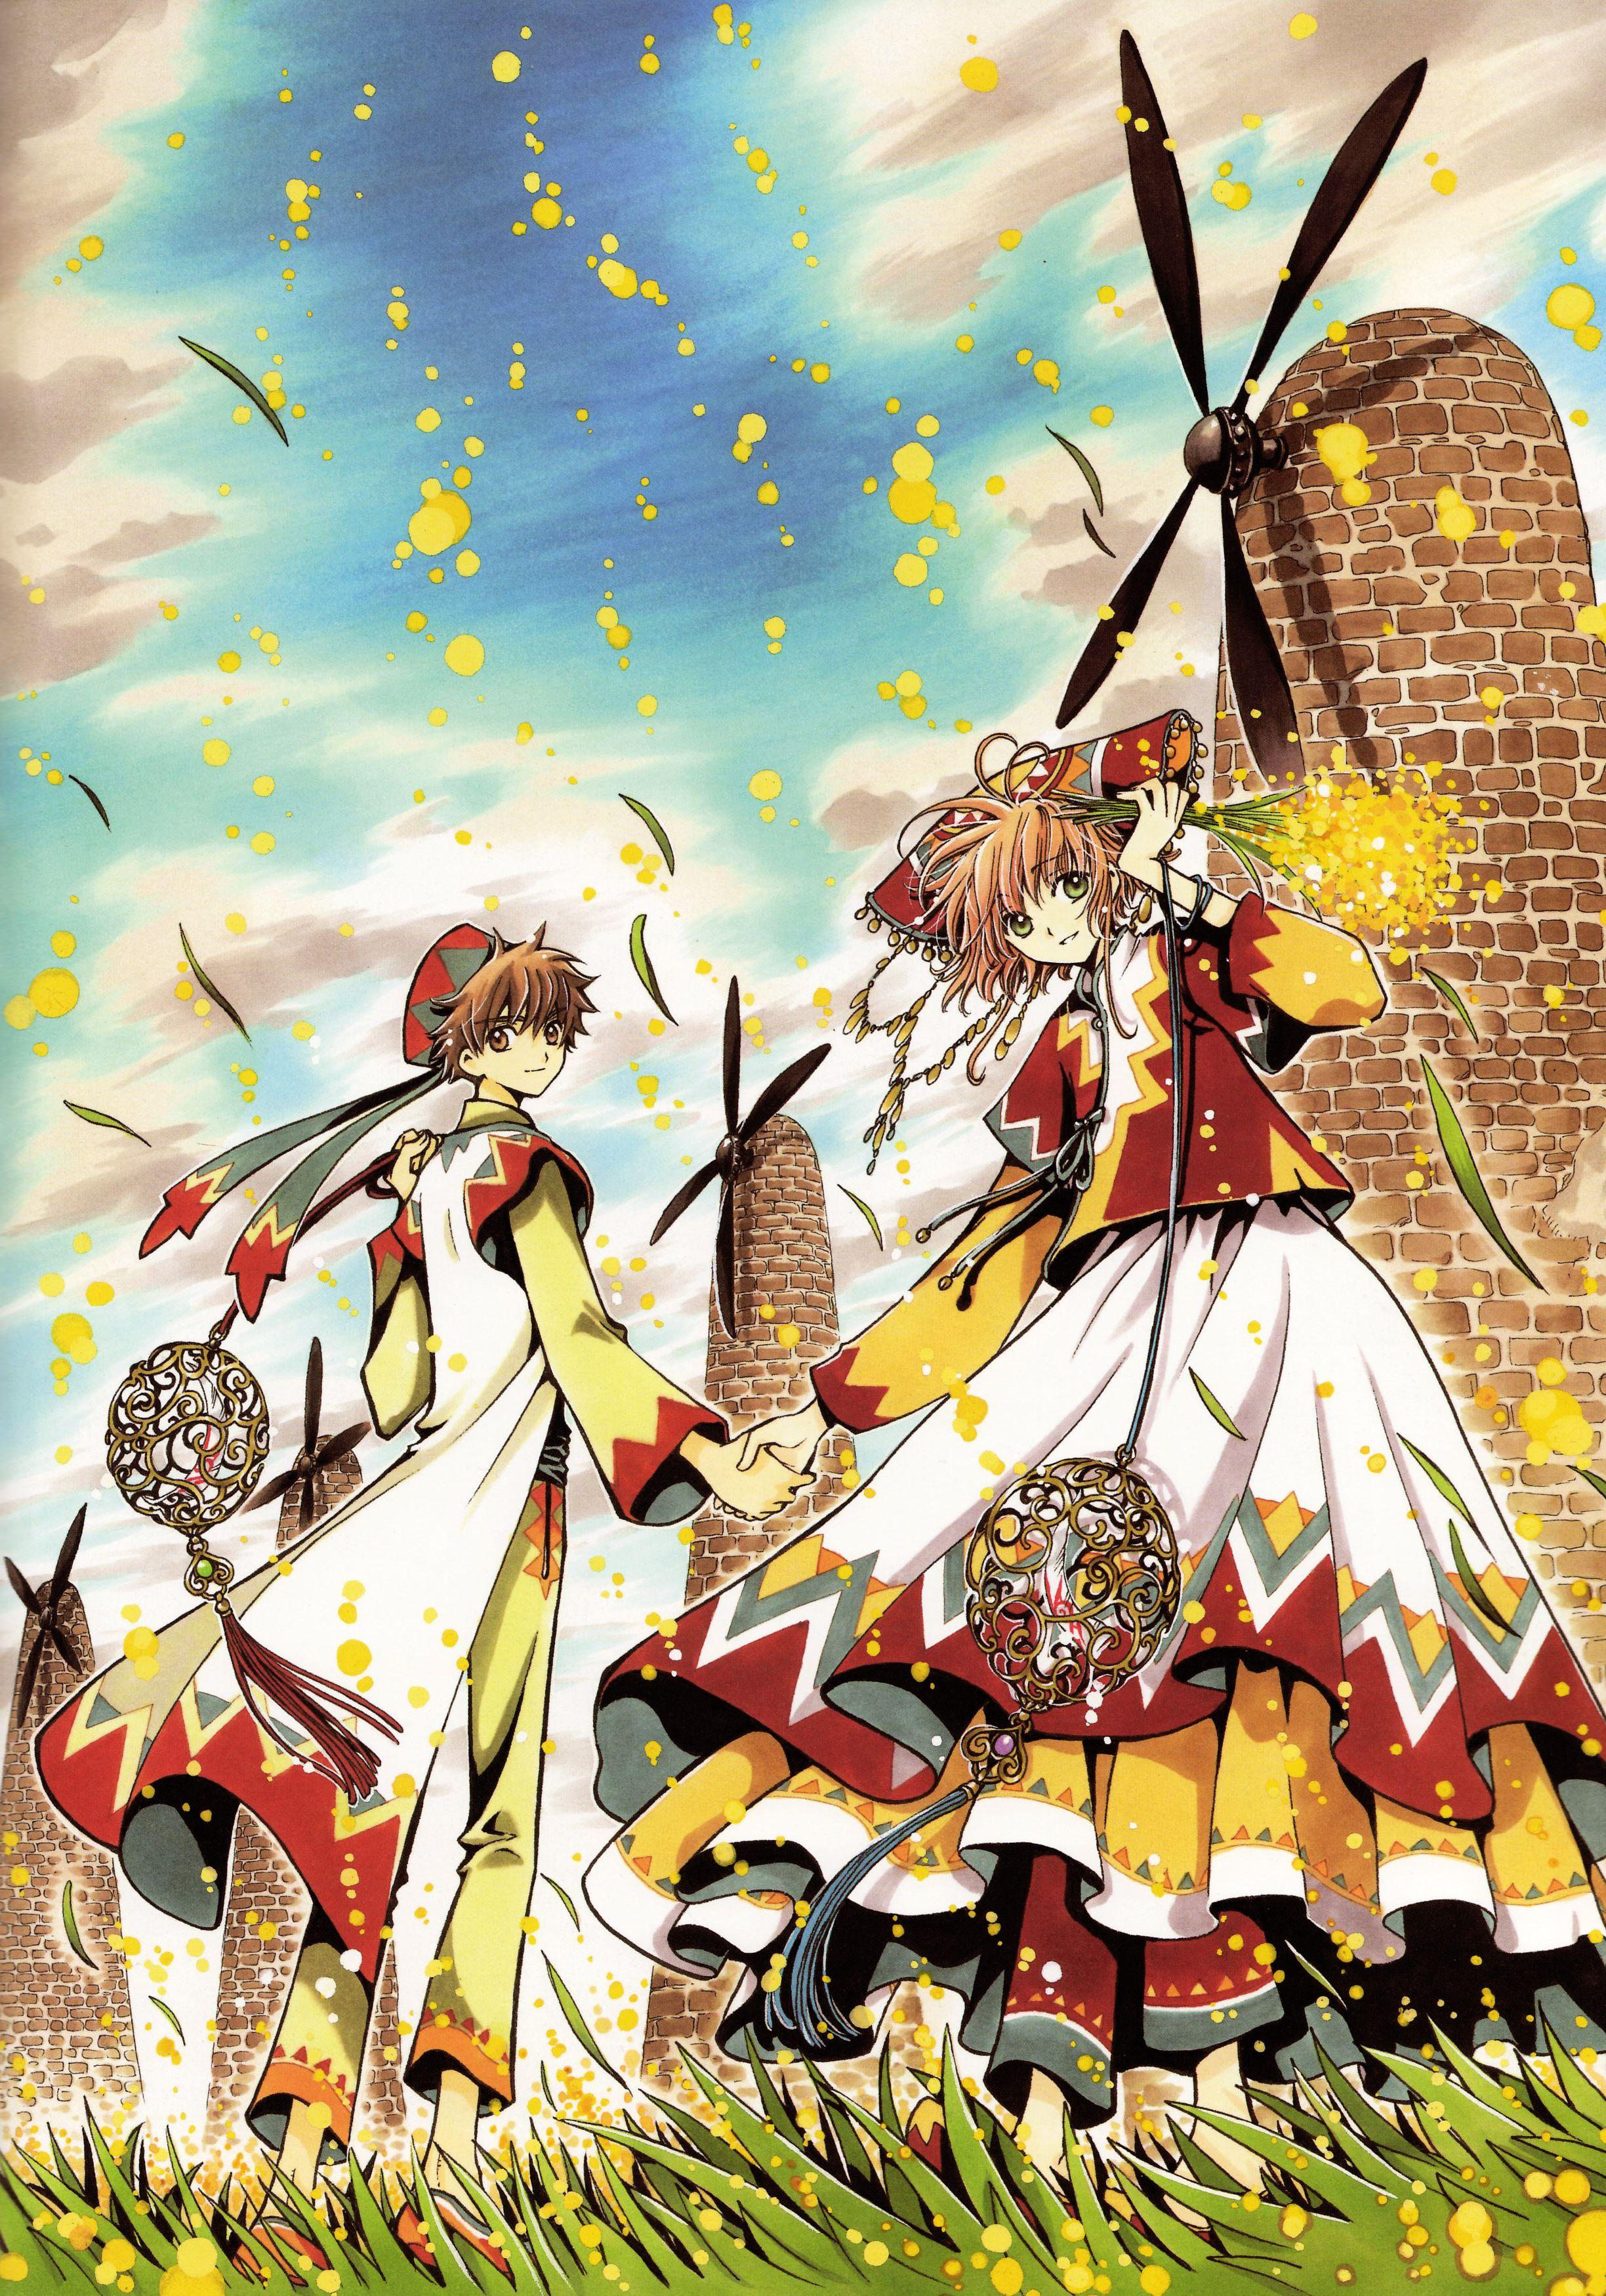 relationship between cardcaptor sakura and tsubasa chronicles